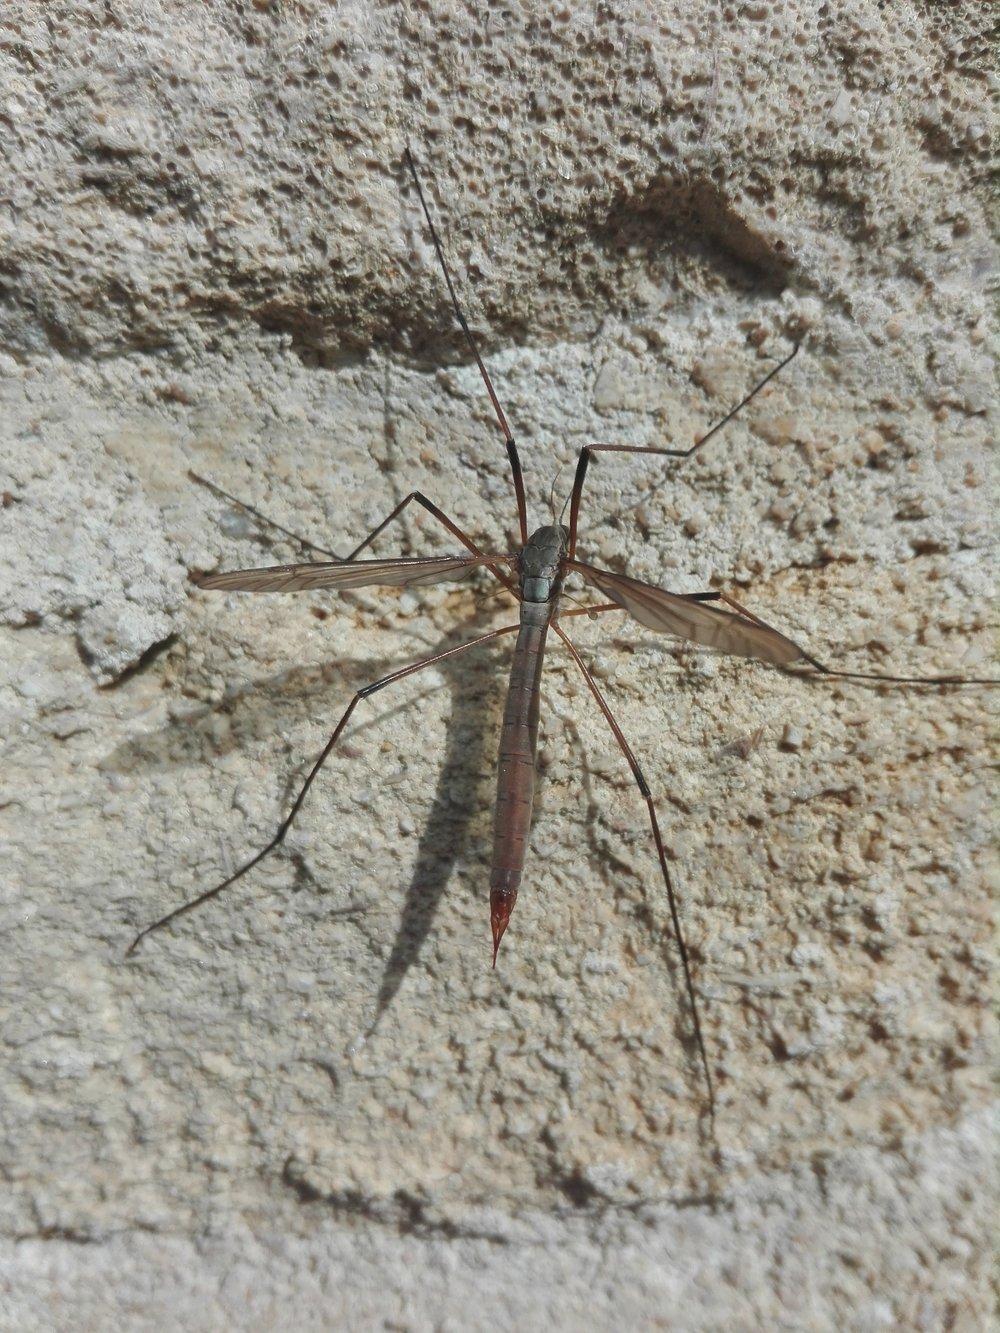 344 Tipula paludosa.jpg